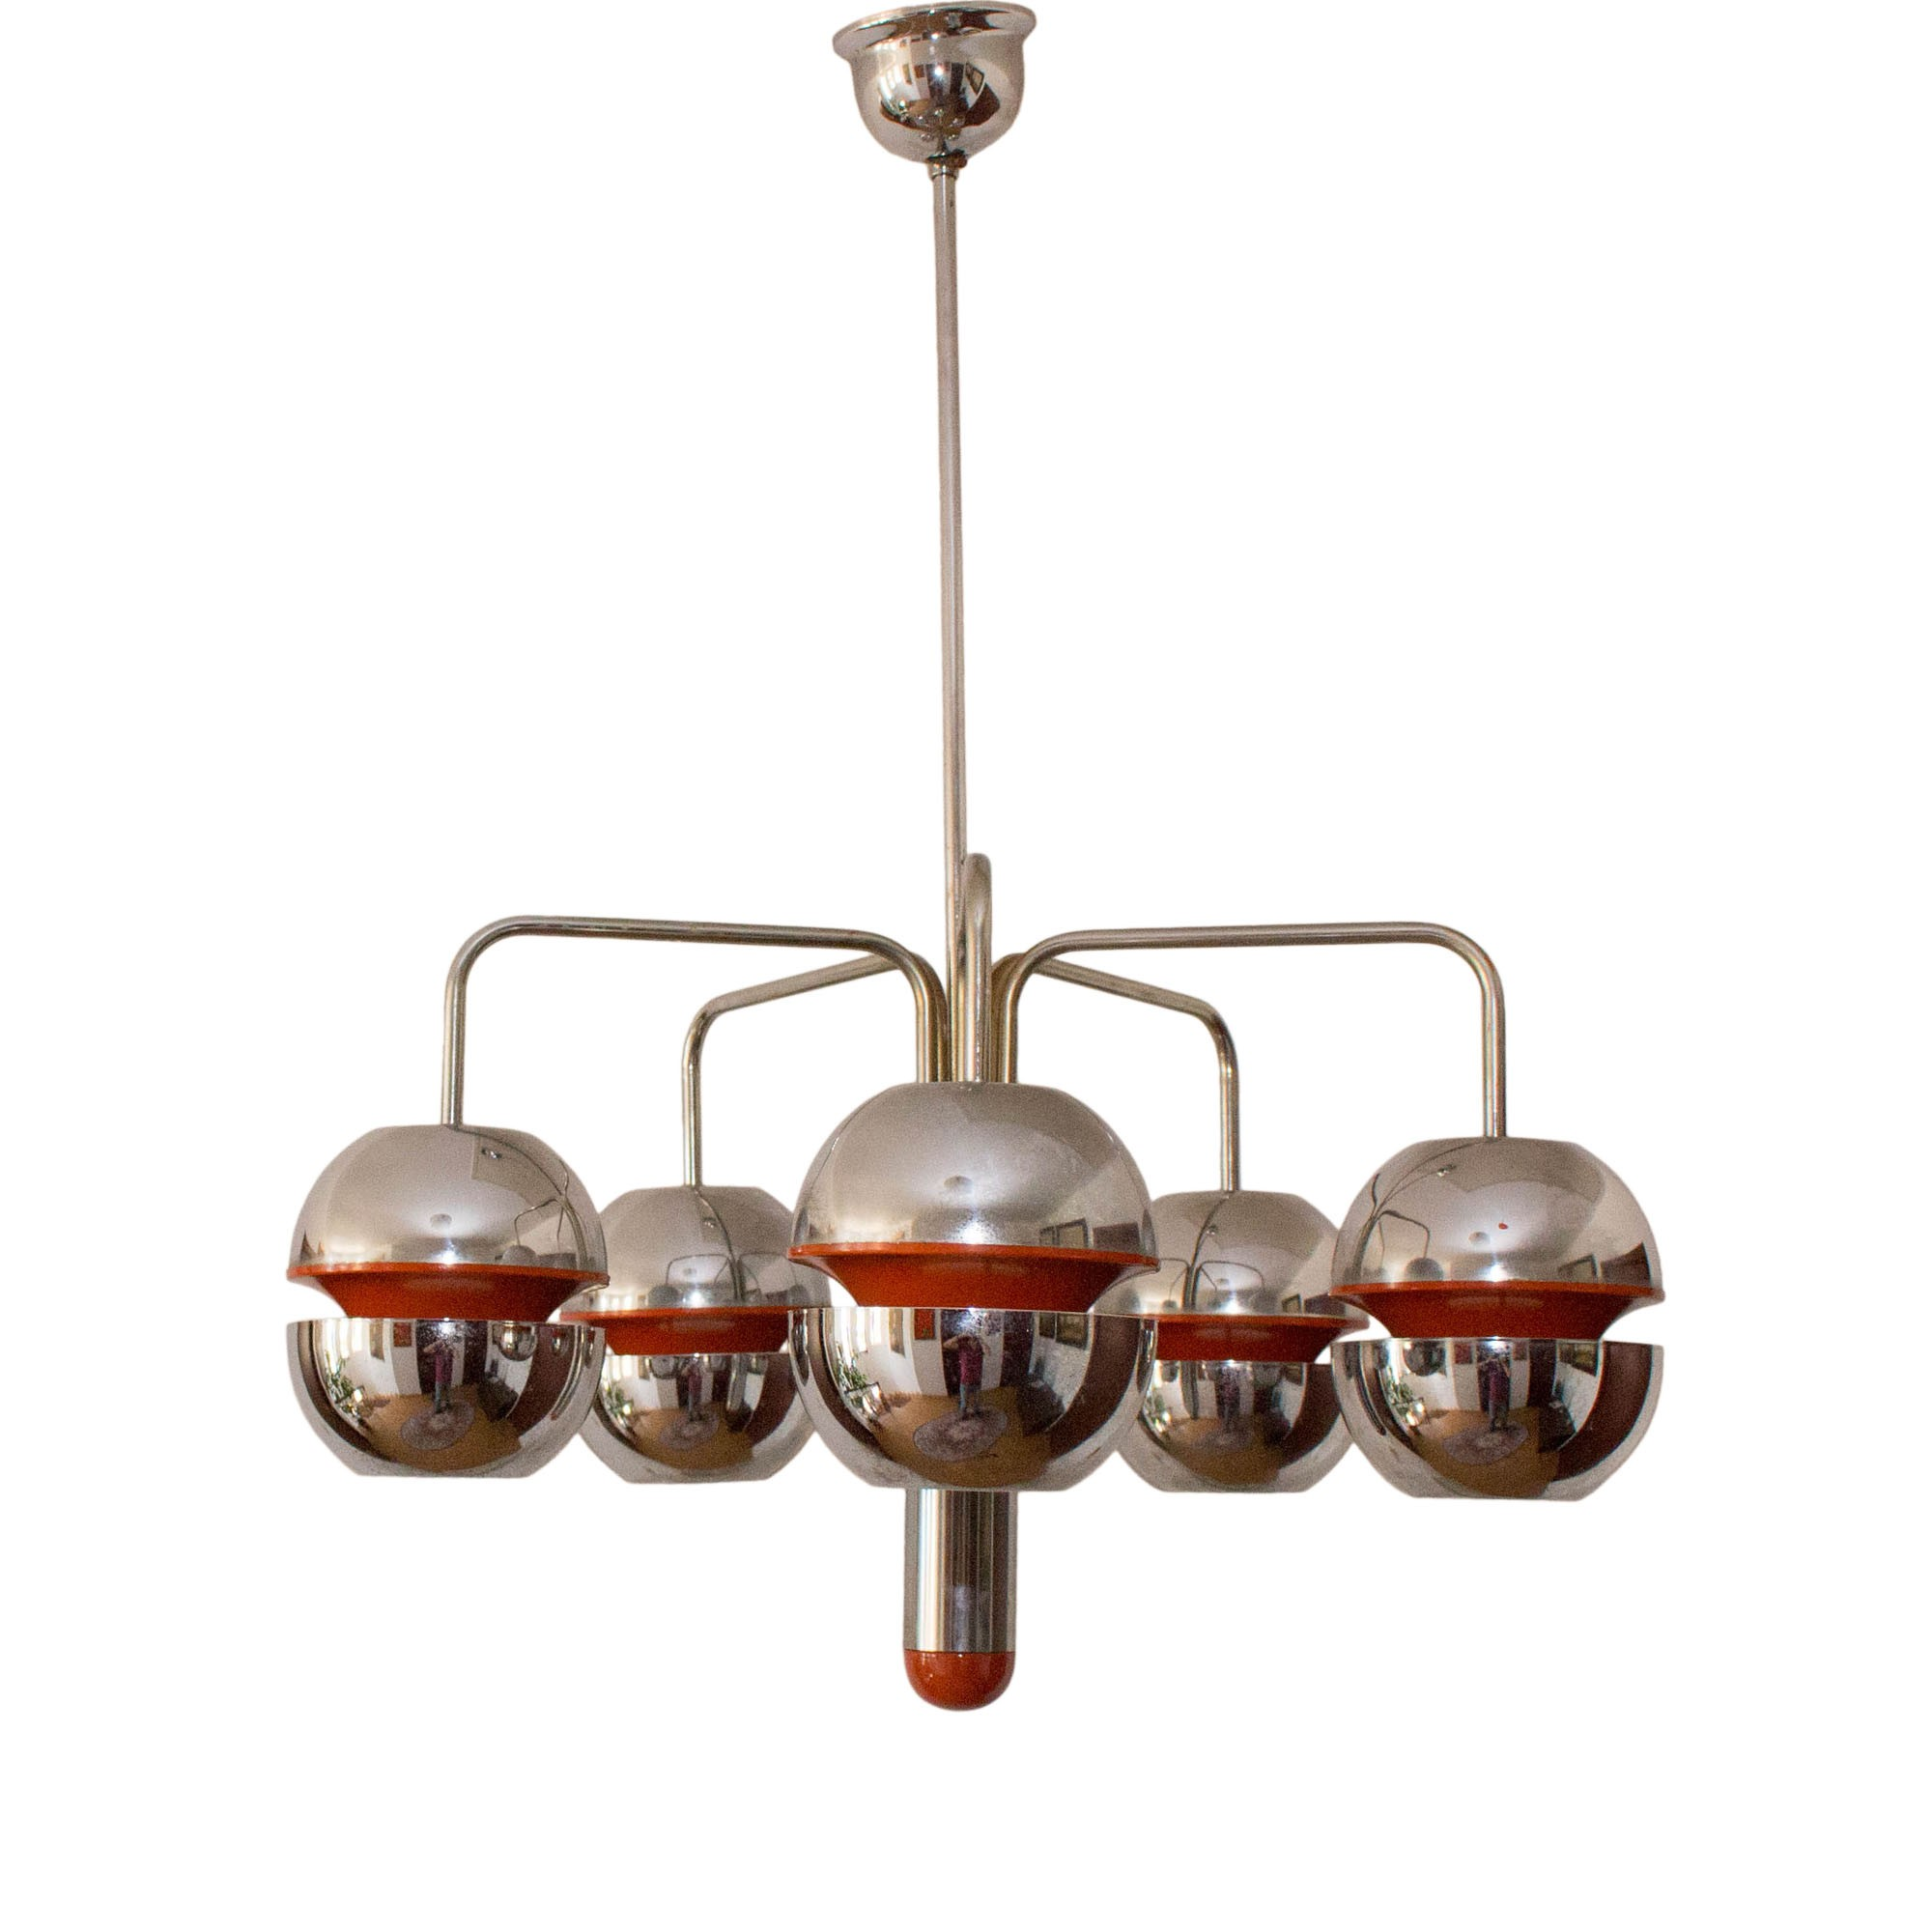 Atomic Age chandelier in chromed metal Belgium 1960s Design